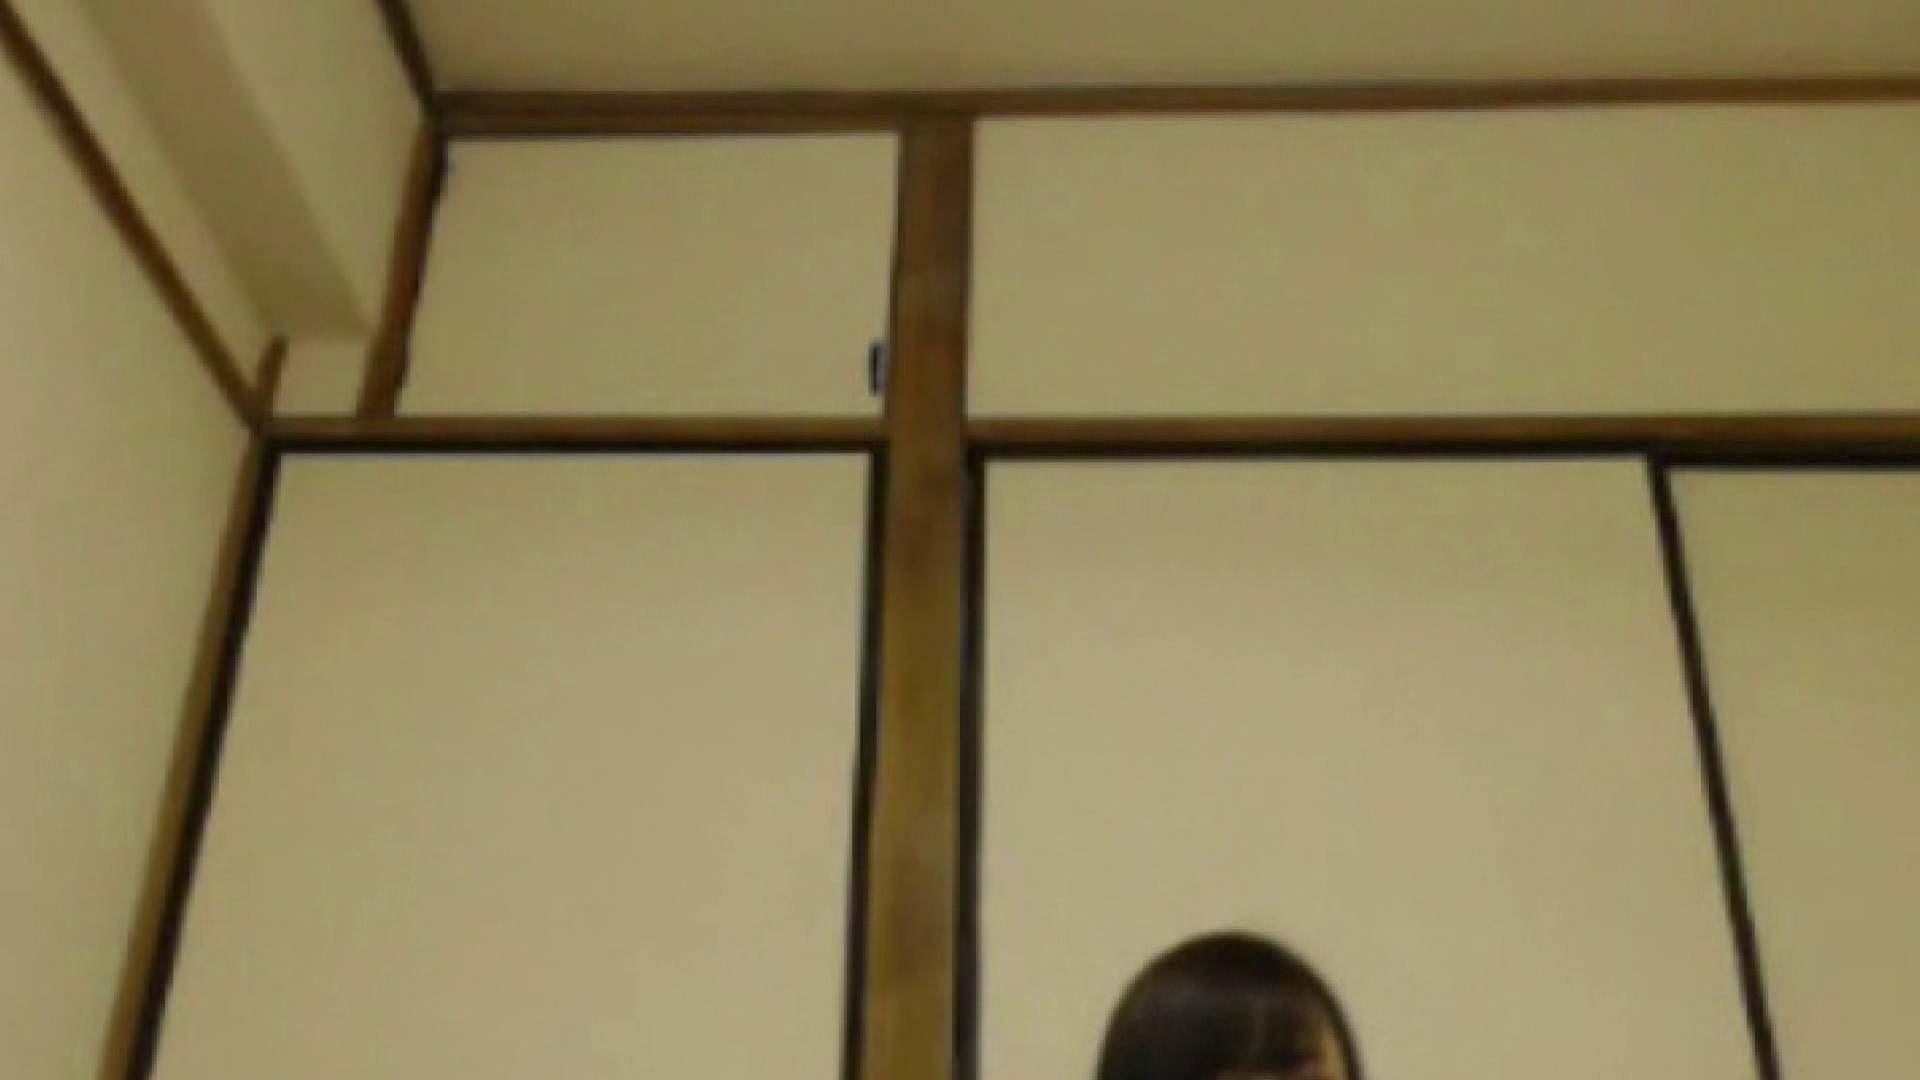 S級ギャルのハメ撮り!生チャット!Vol.21後編 素人見放題 盗撮動画紹介 91PIX 26